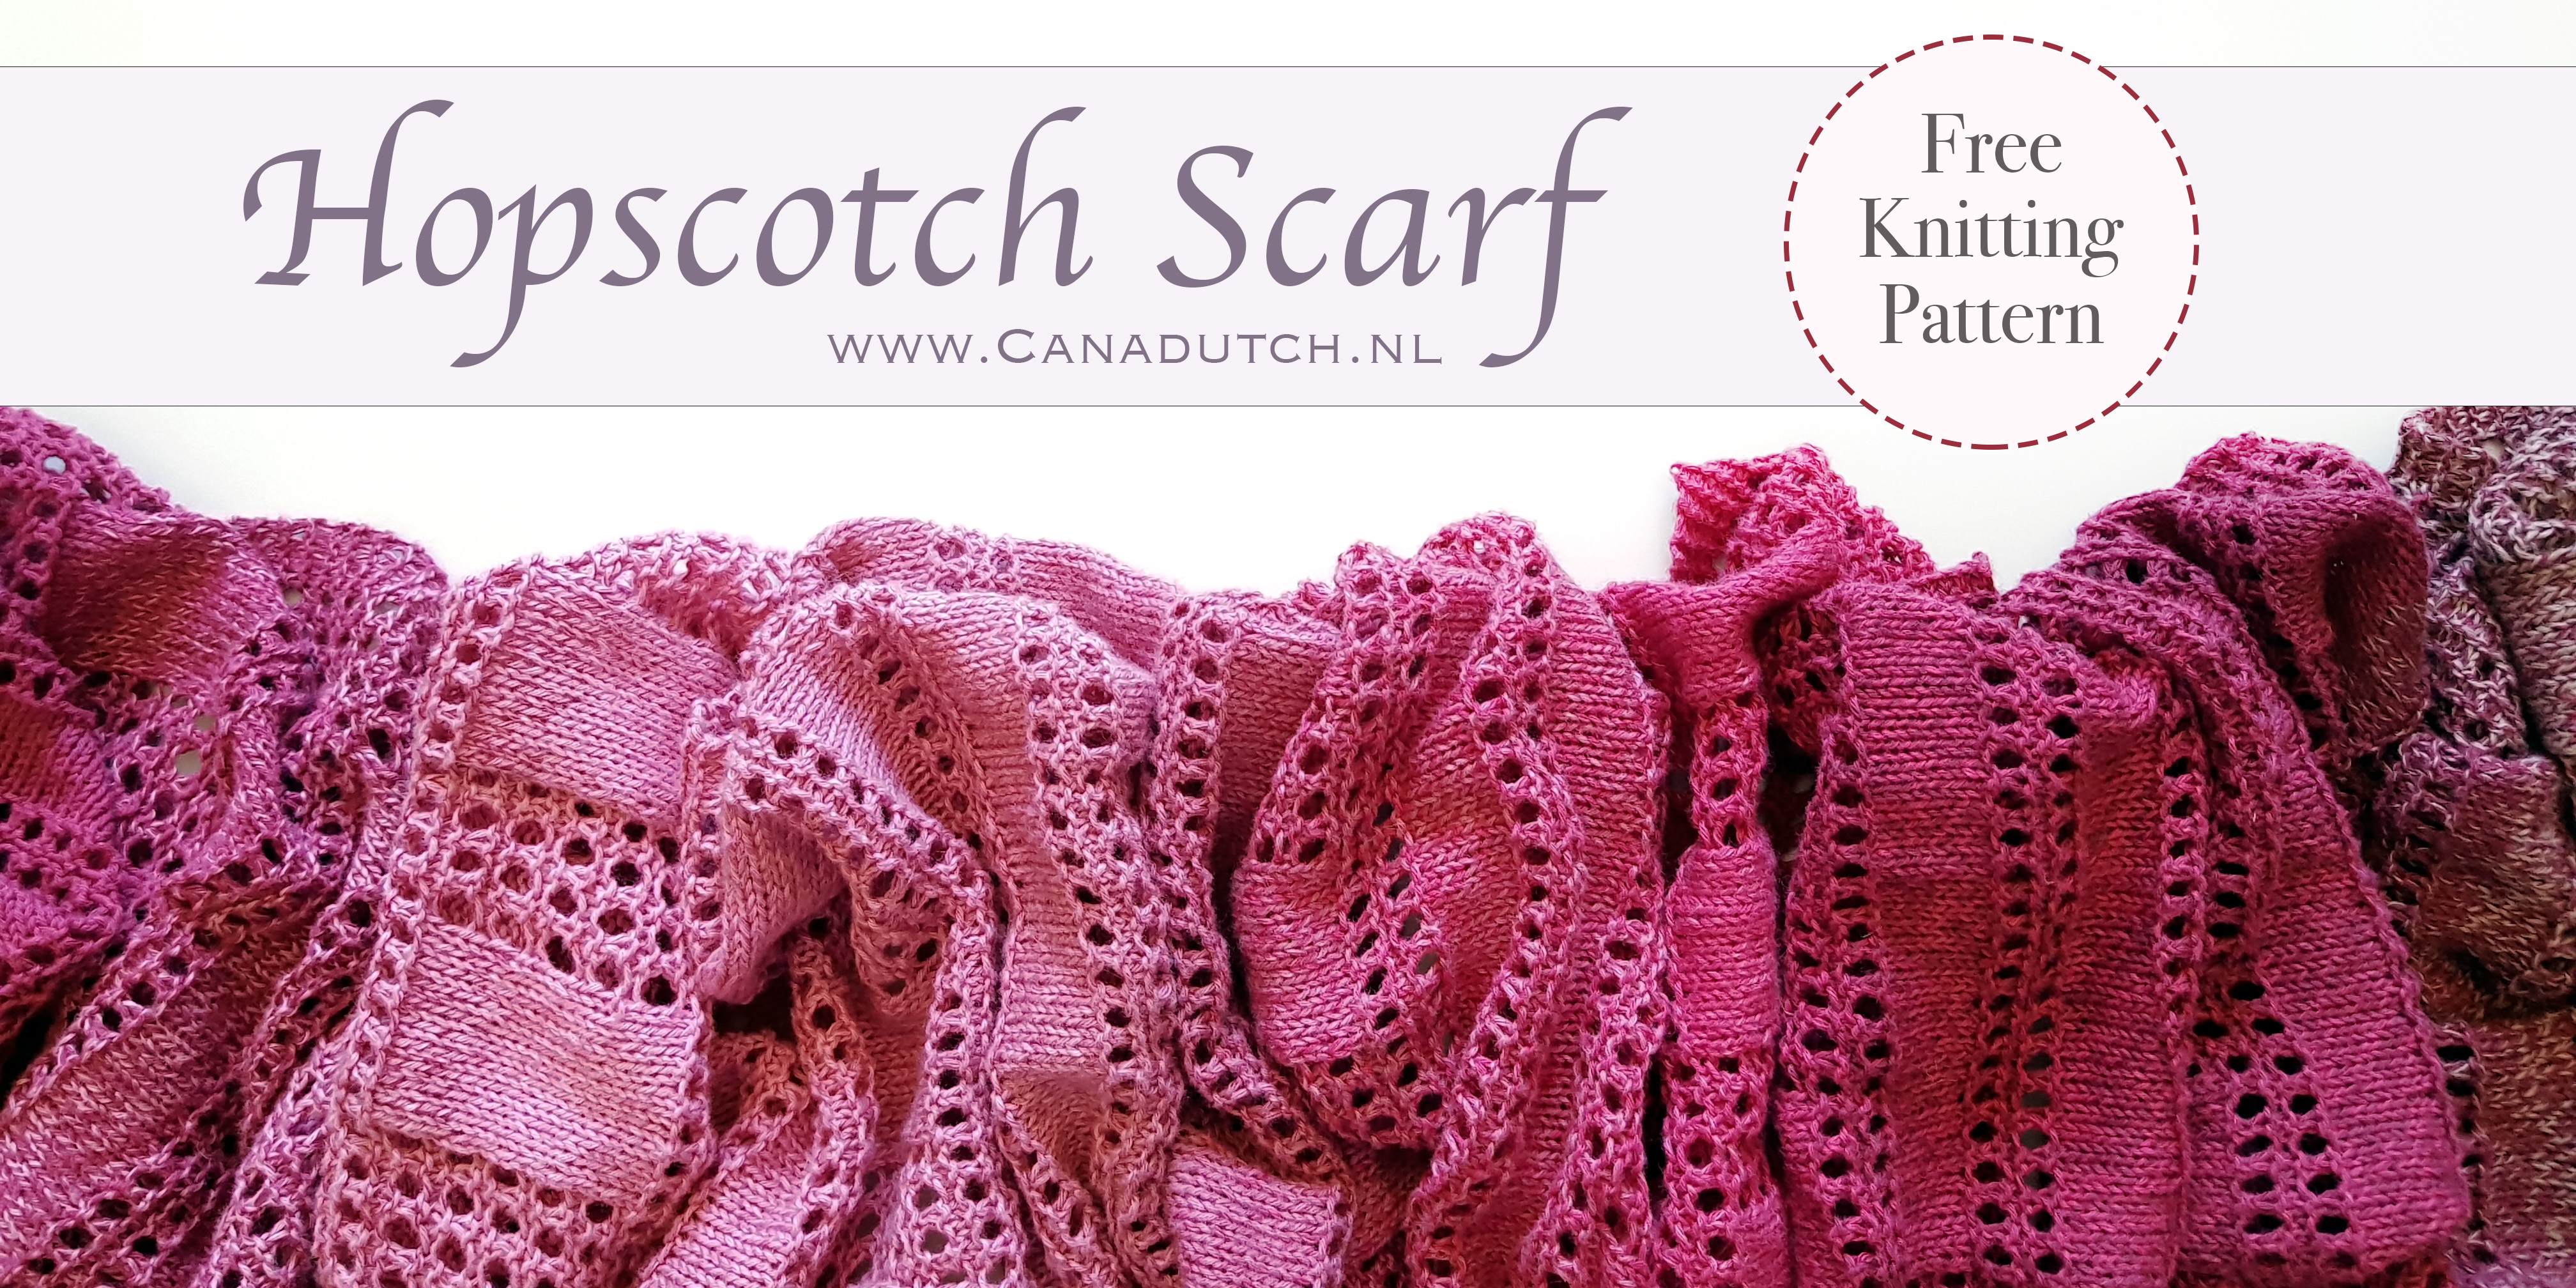 Hopscotch Scarf Free Knitting Pattern Canadutch